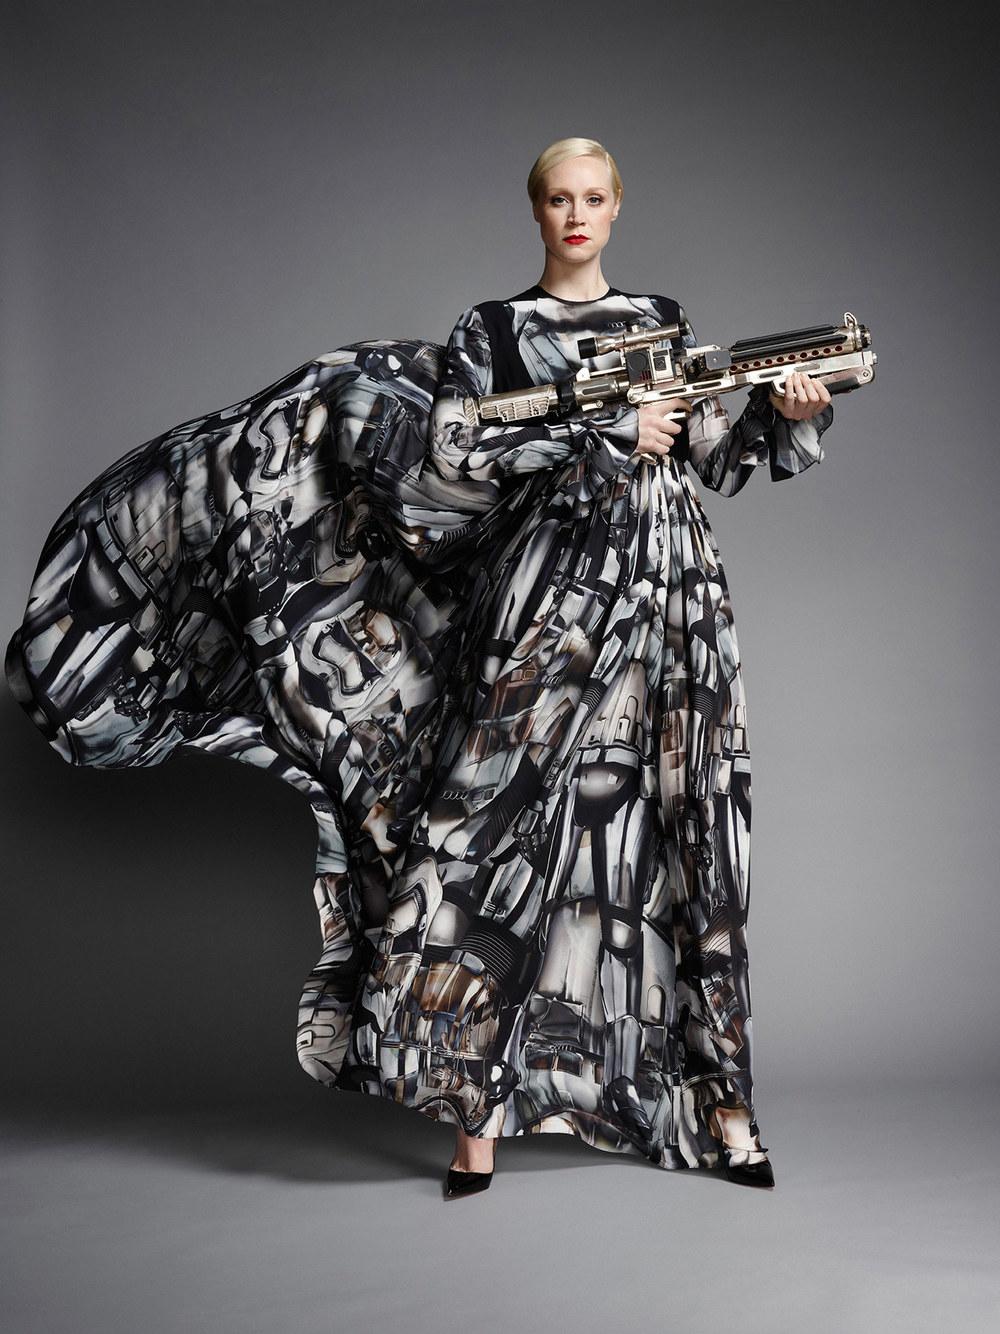 Gwendoline Christie Models Stylish Captain Phasma Gown